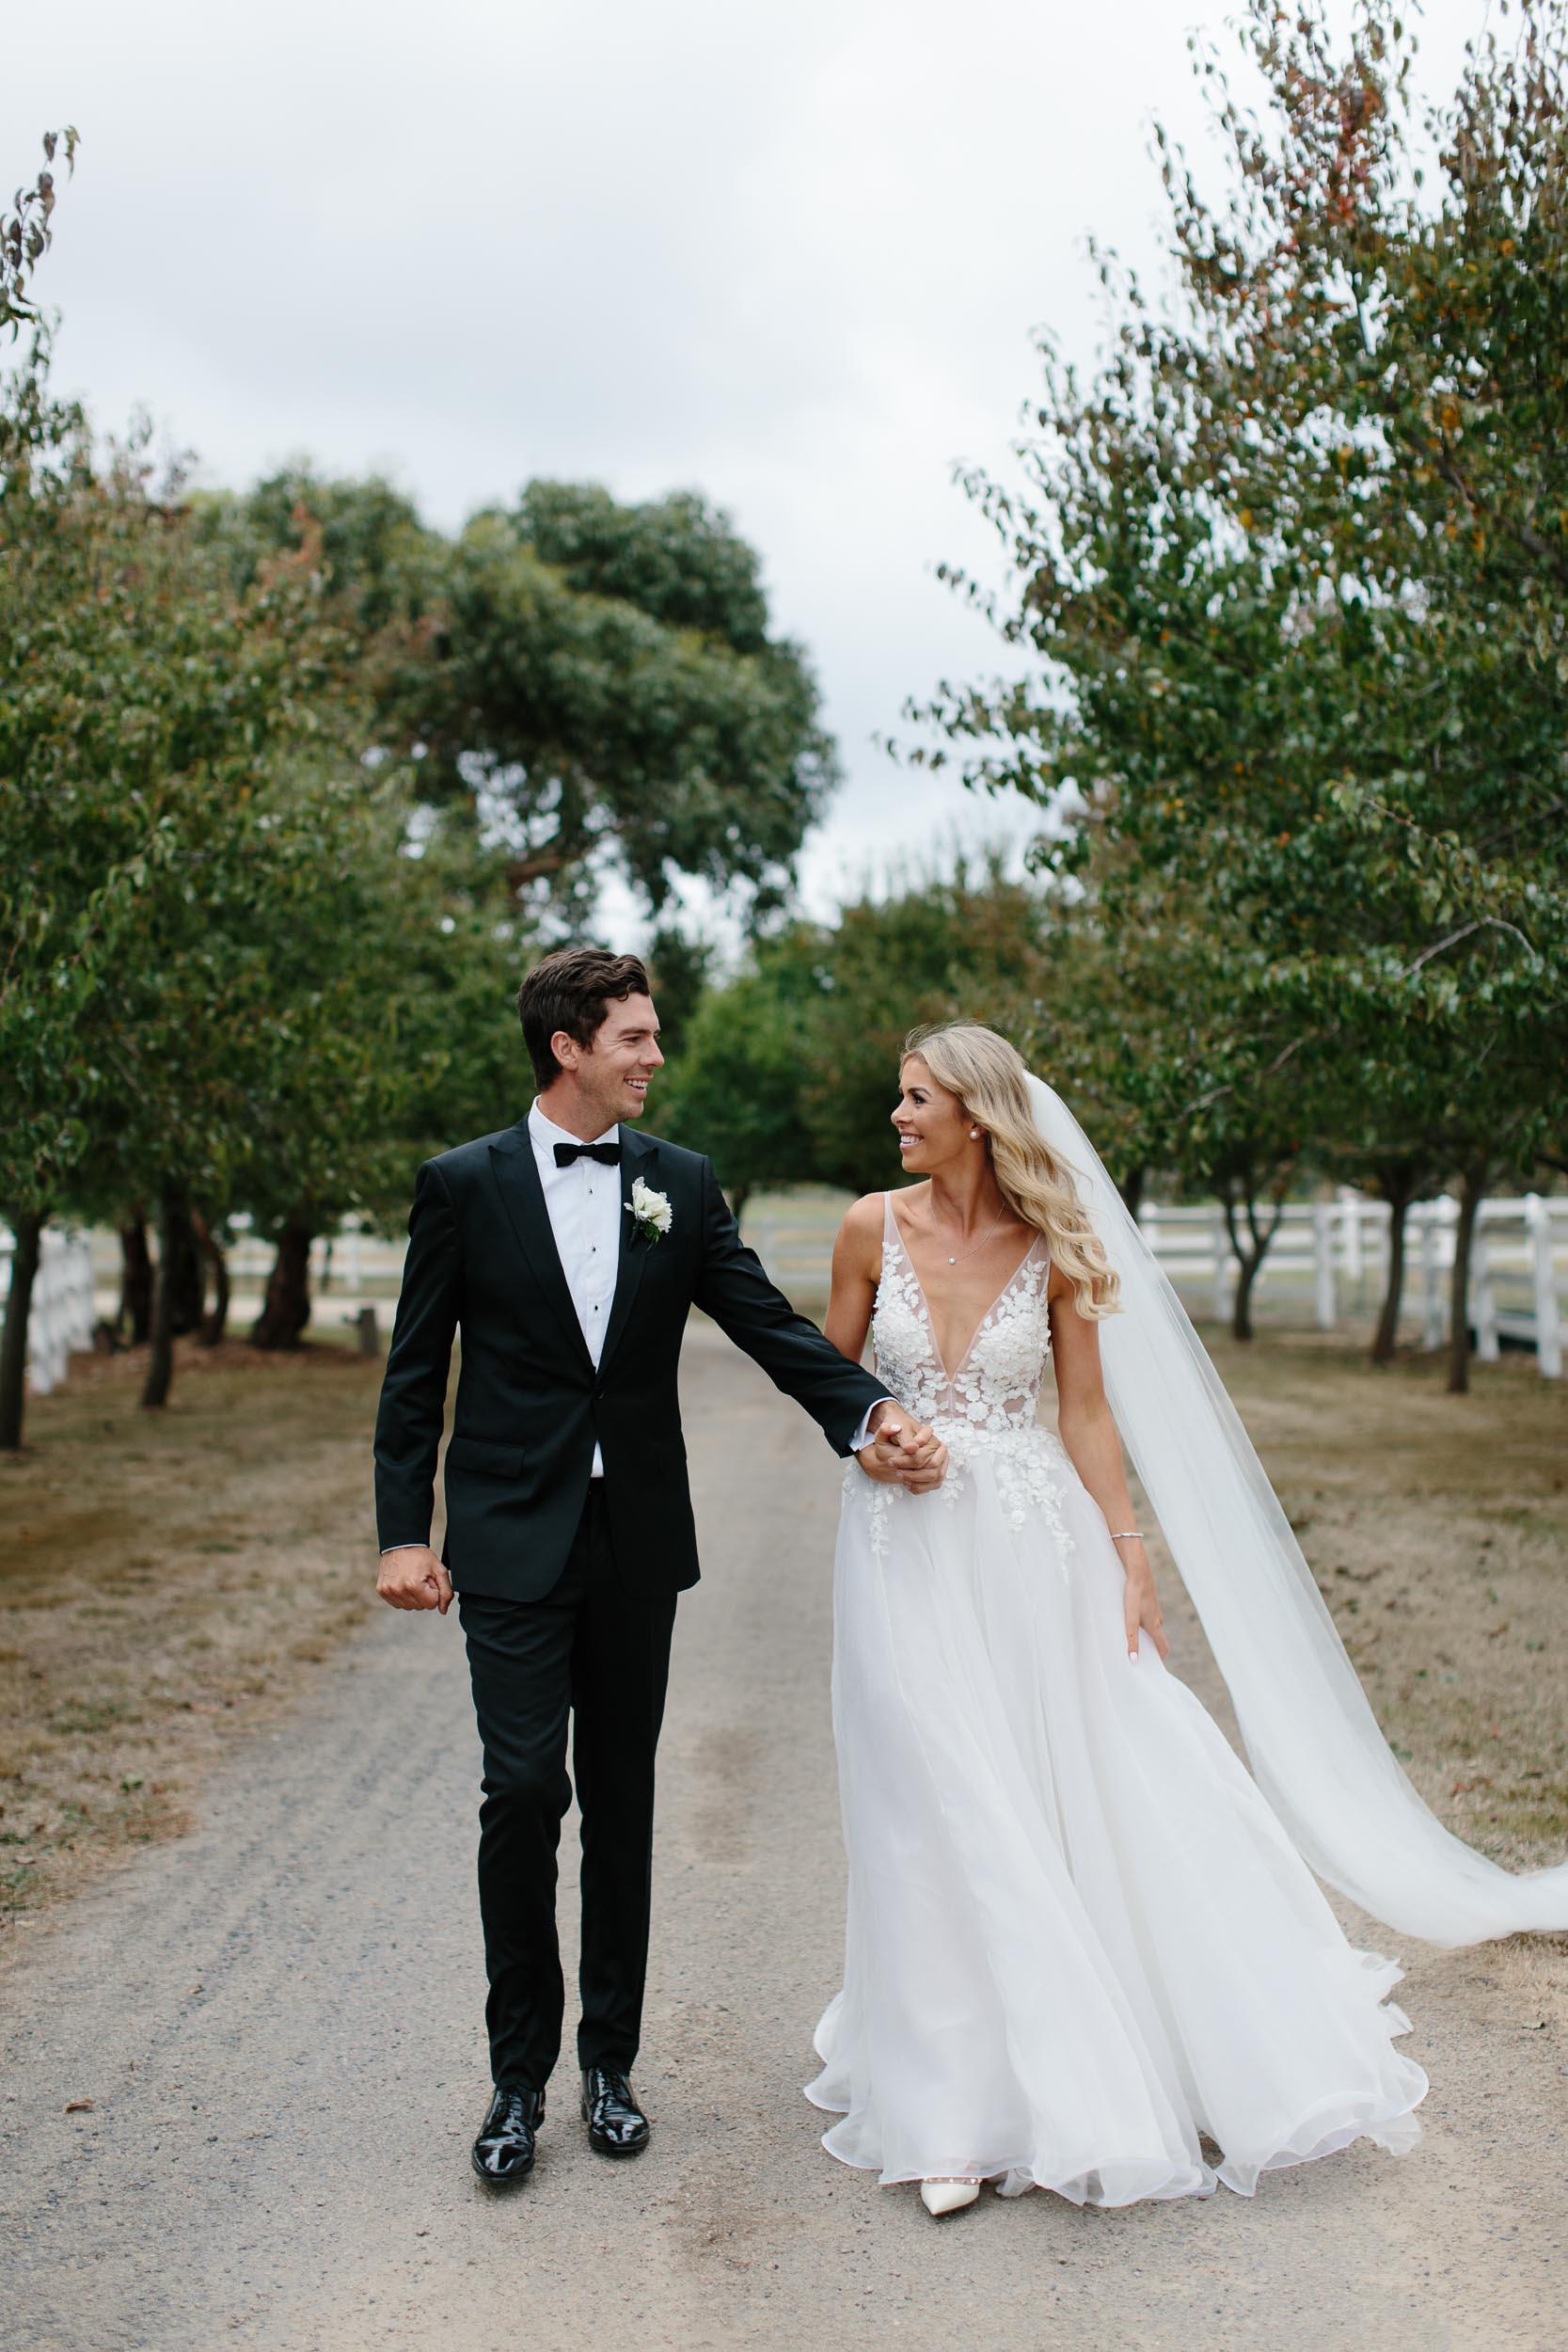 Kas-Richards-Mornington-Peninsula-Private-Property-Wedding-Marianna-Hardwick-Gown-500.jpg